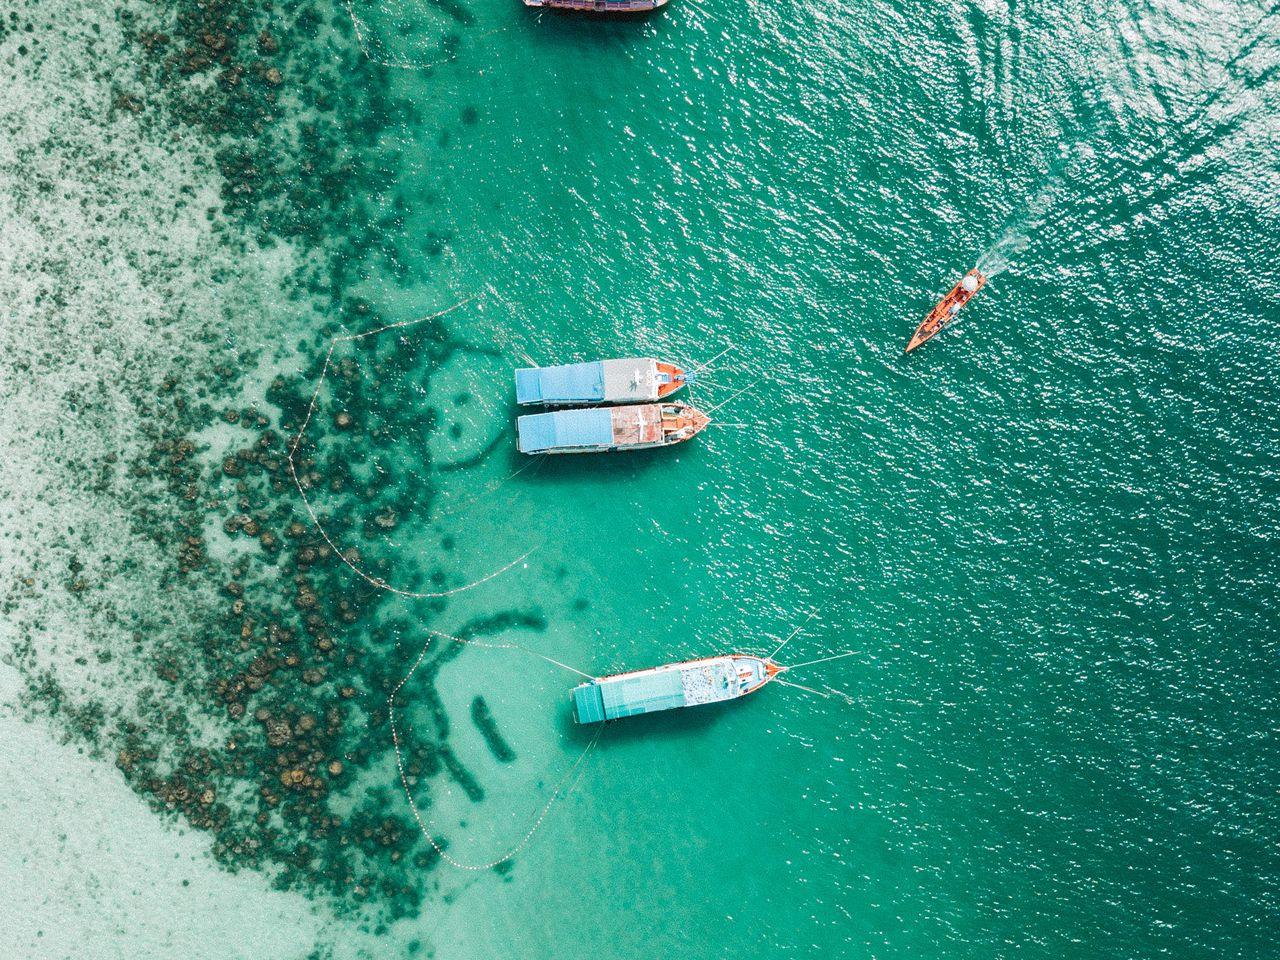 1280x960 Wallpaper shore, boats, sandbar, ocean, moored, aerial view